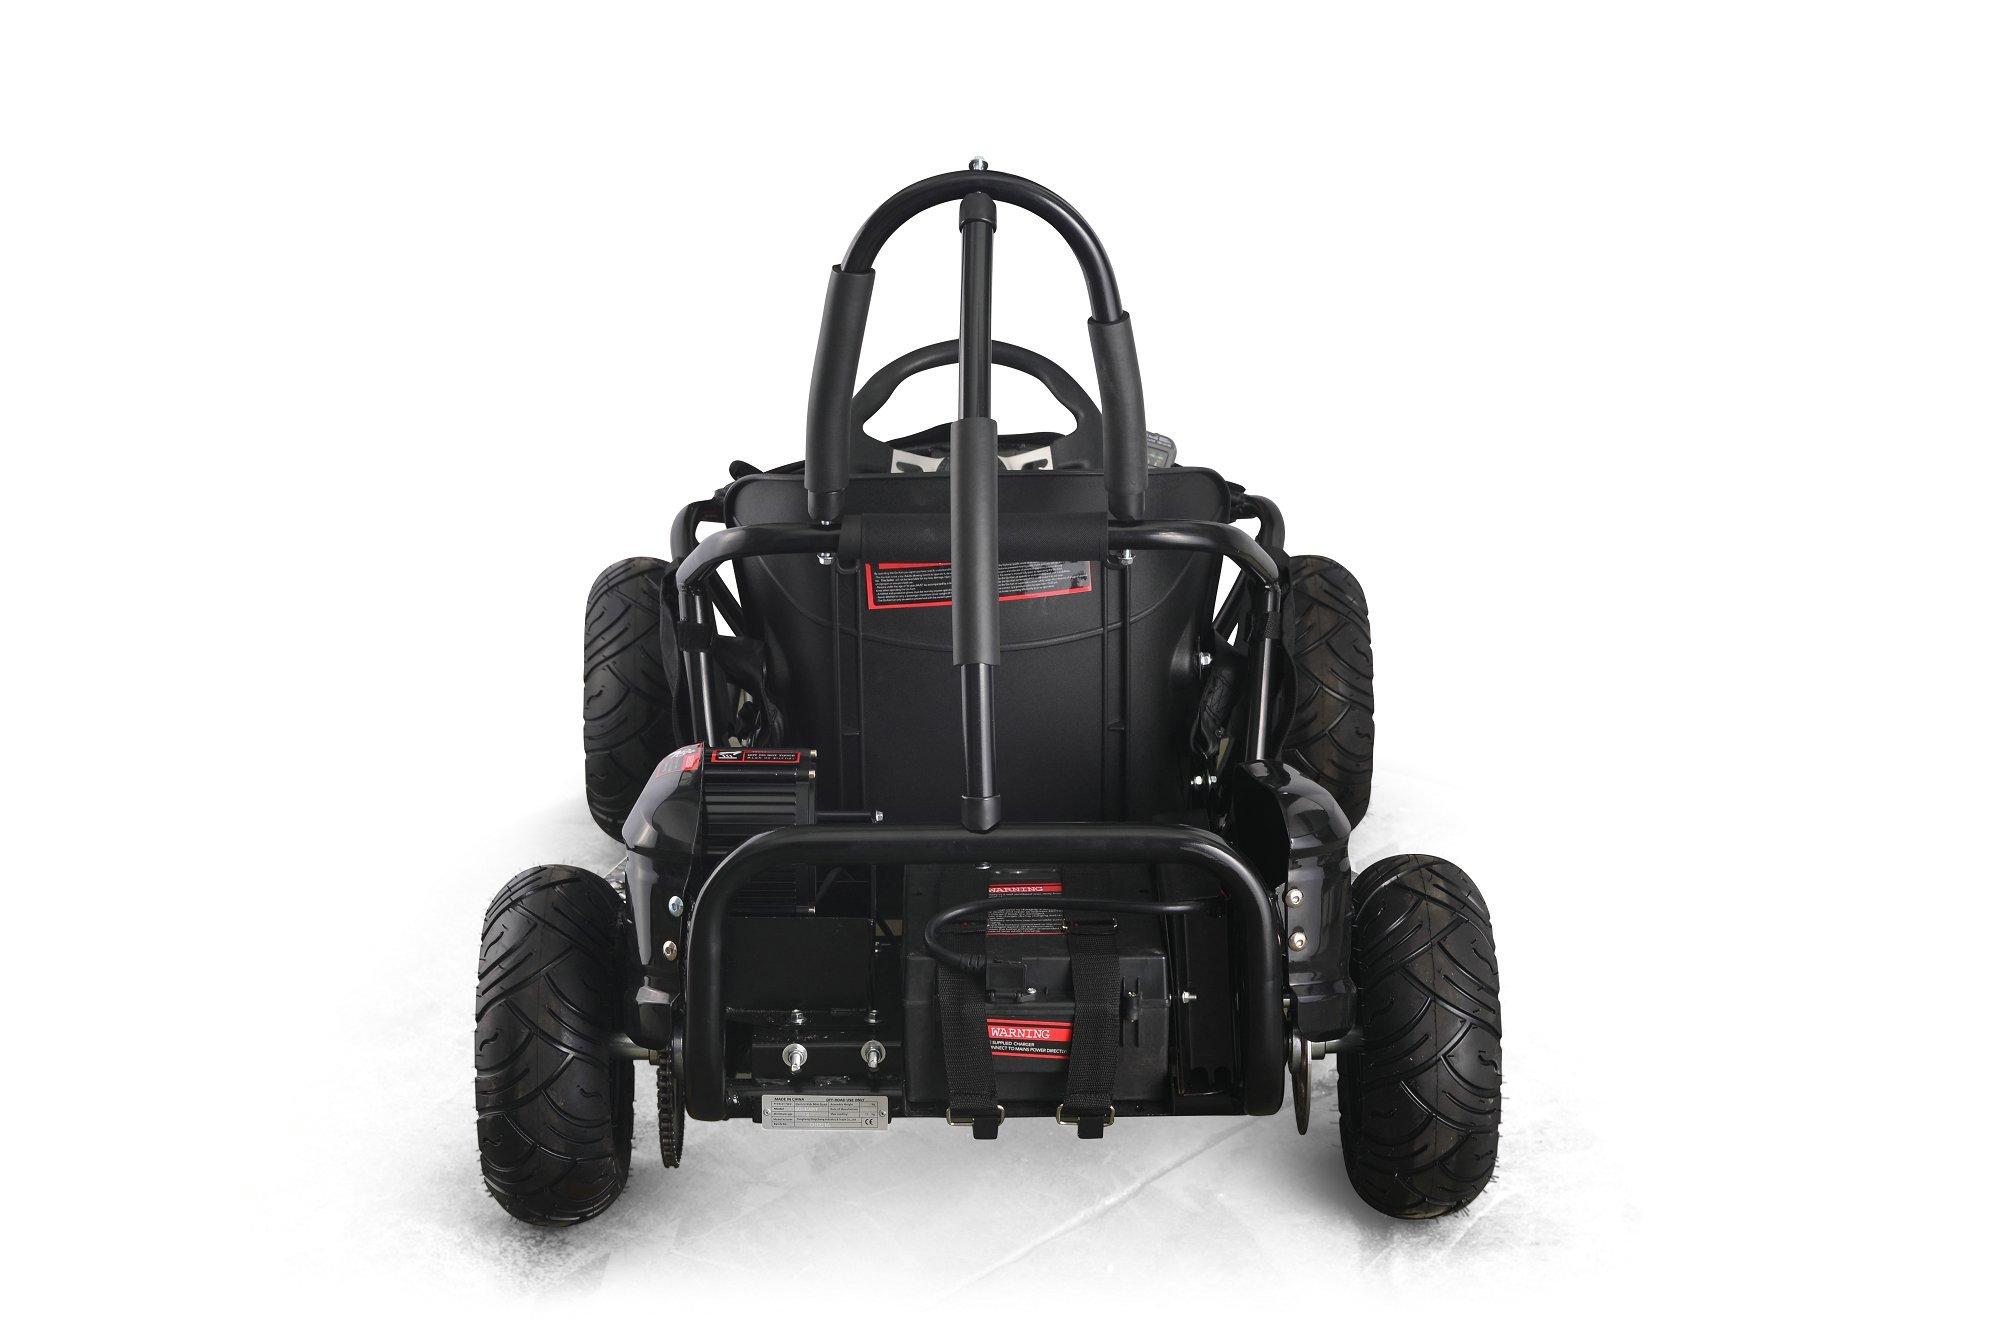 Kart electrico Pekecars 48V 1000W Negro